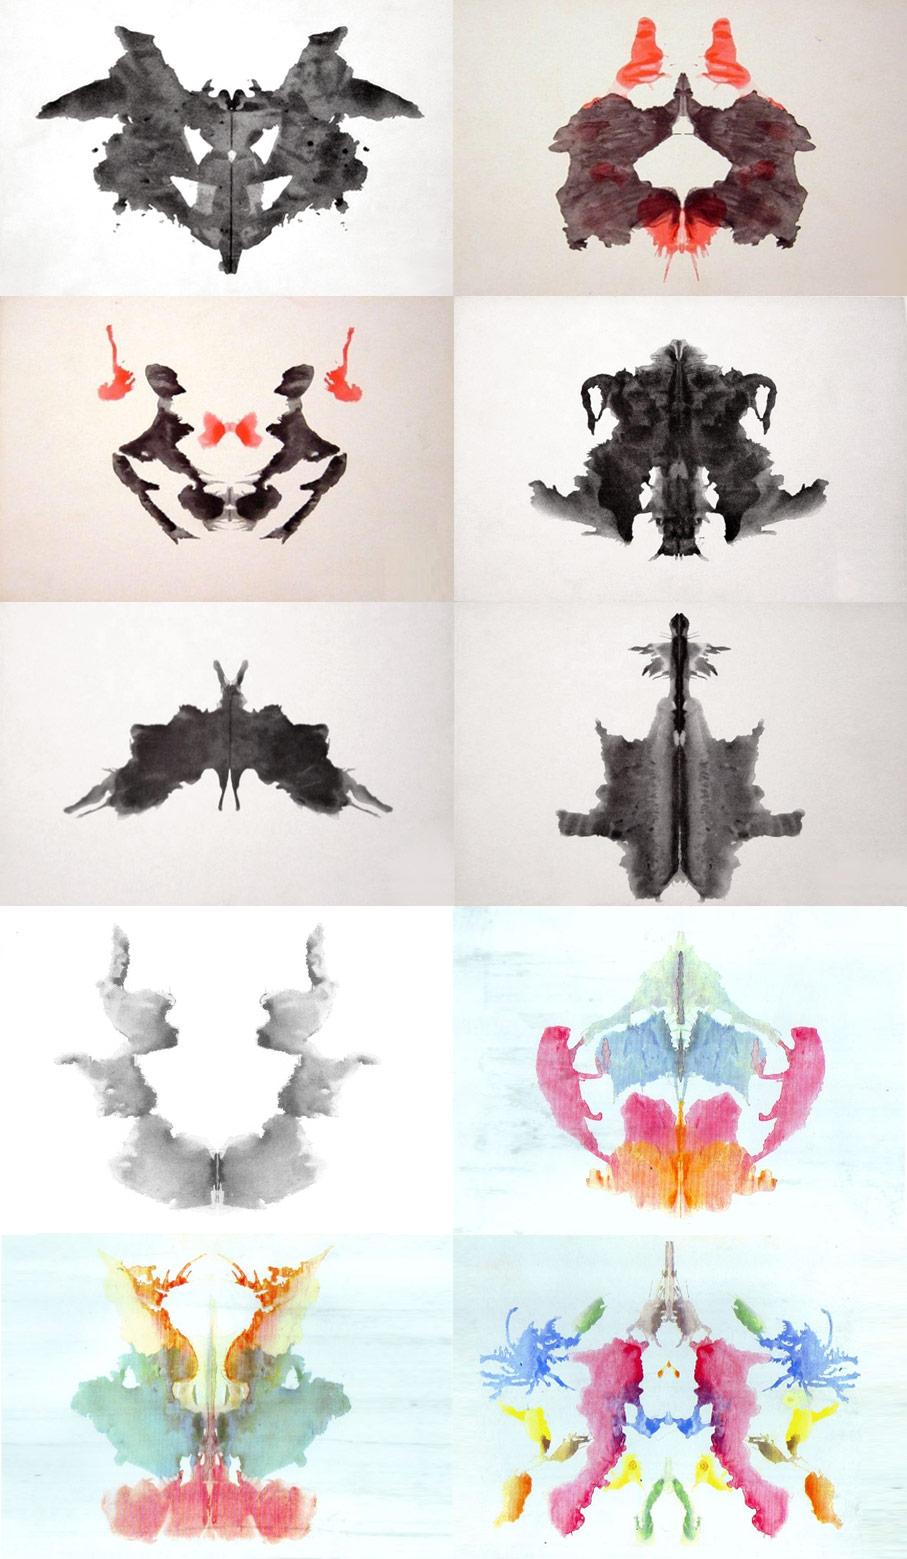 Hermann Rorschach's 10 Cards